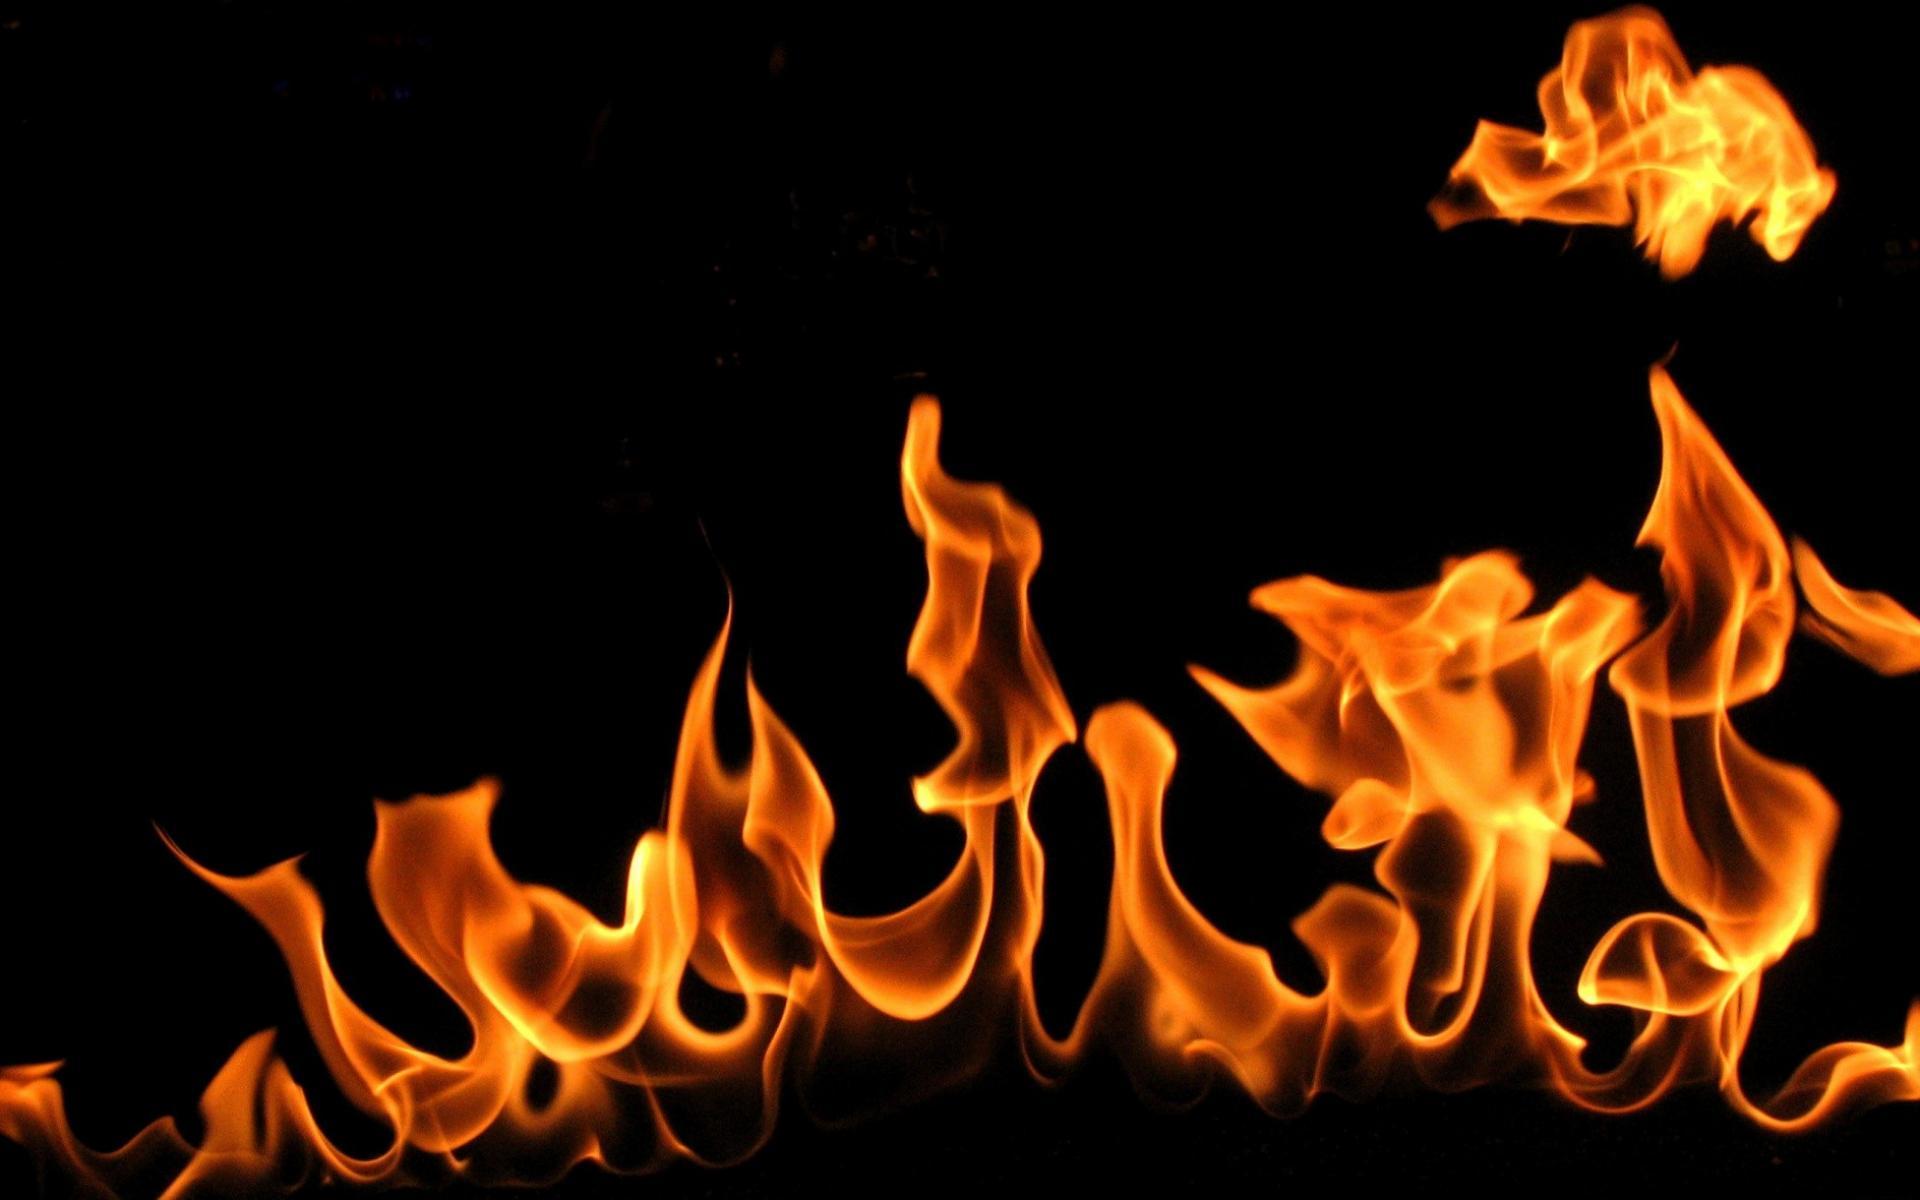 картинки языки пламени